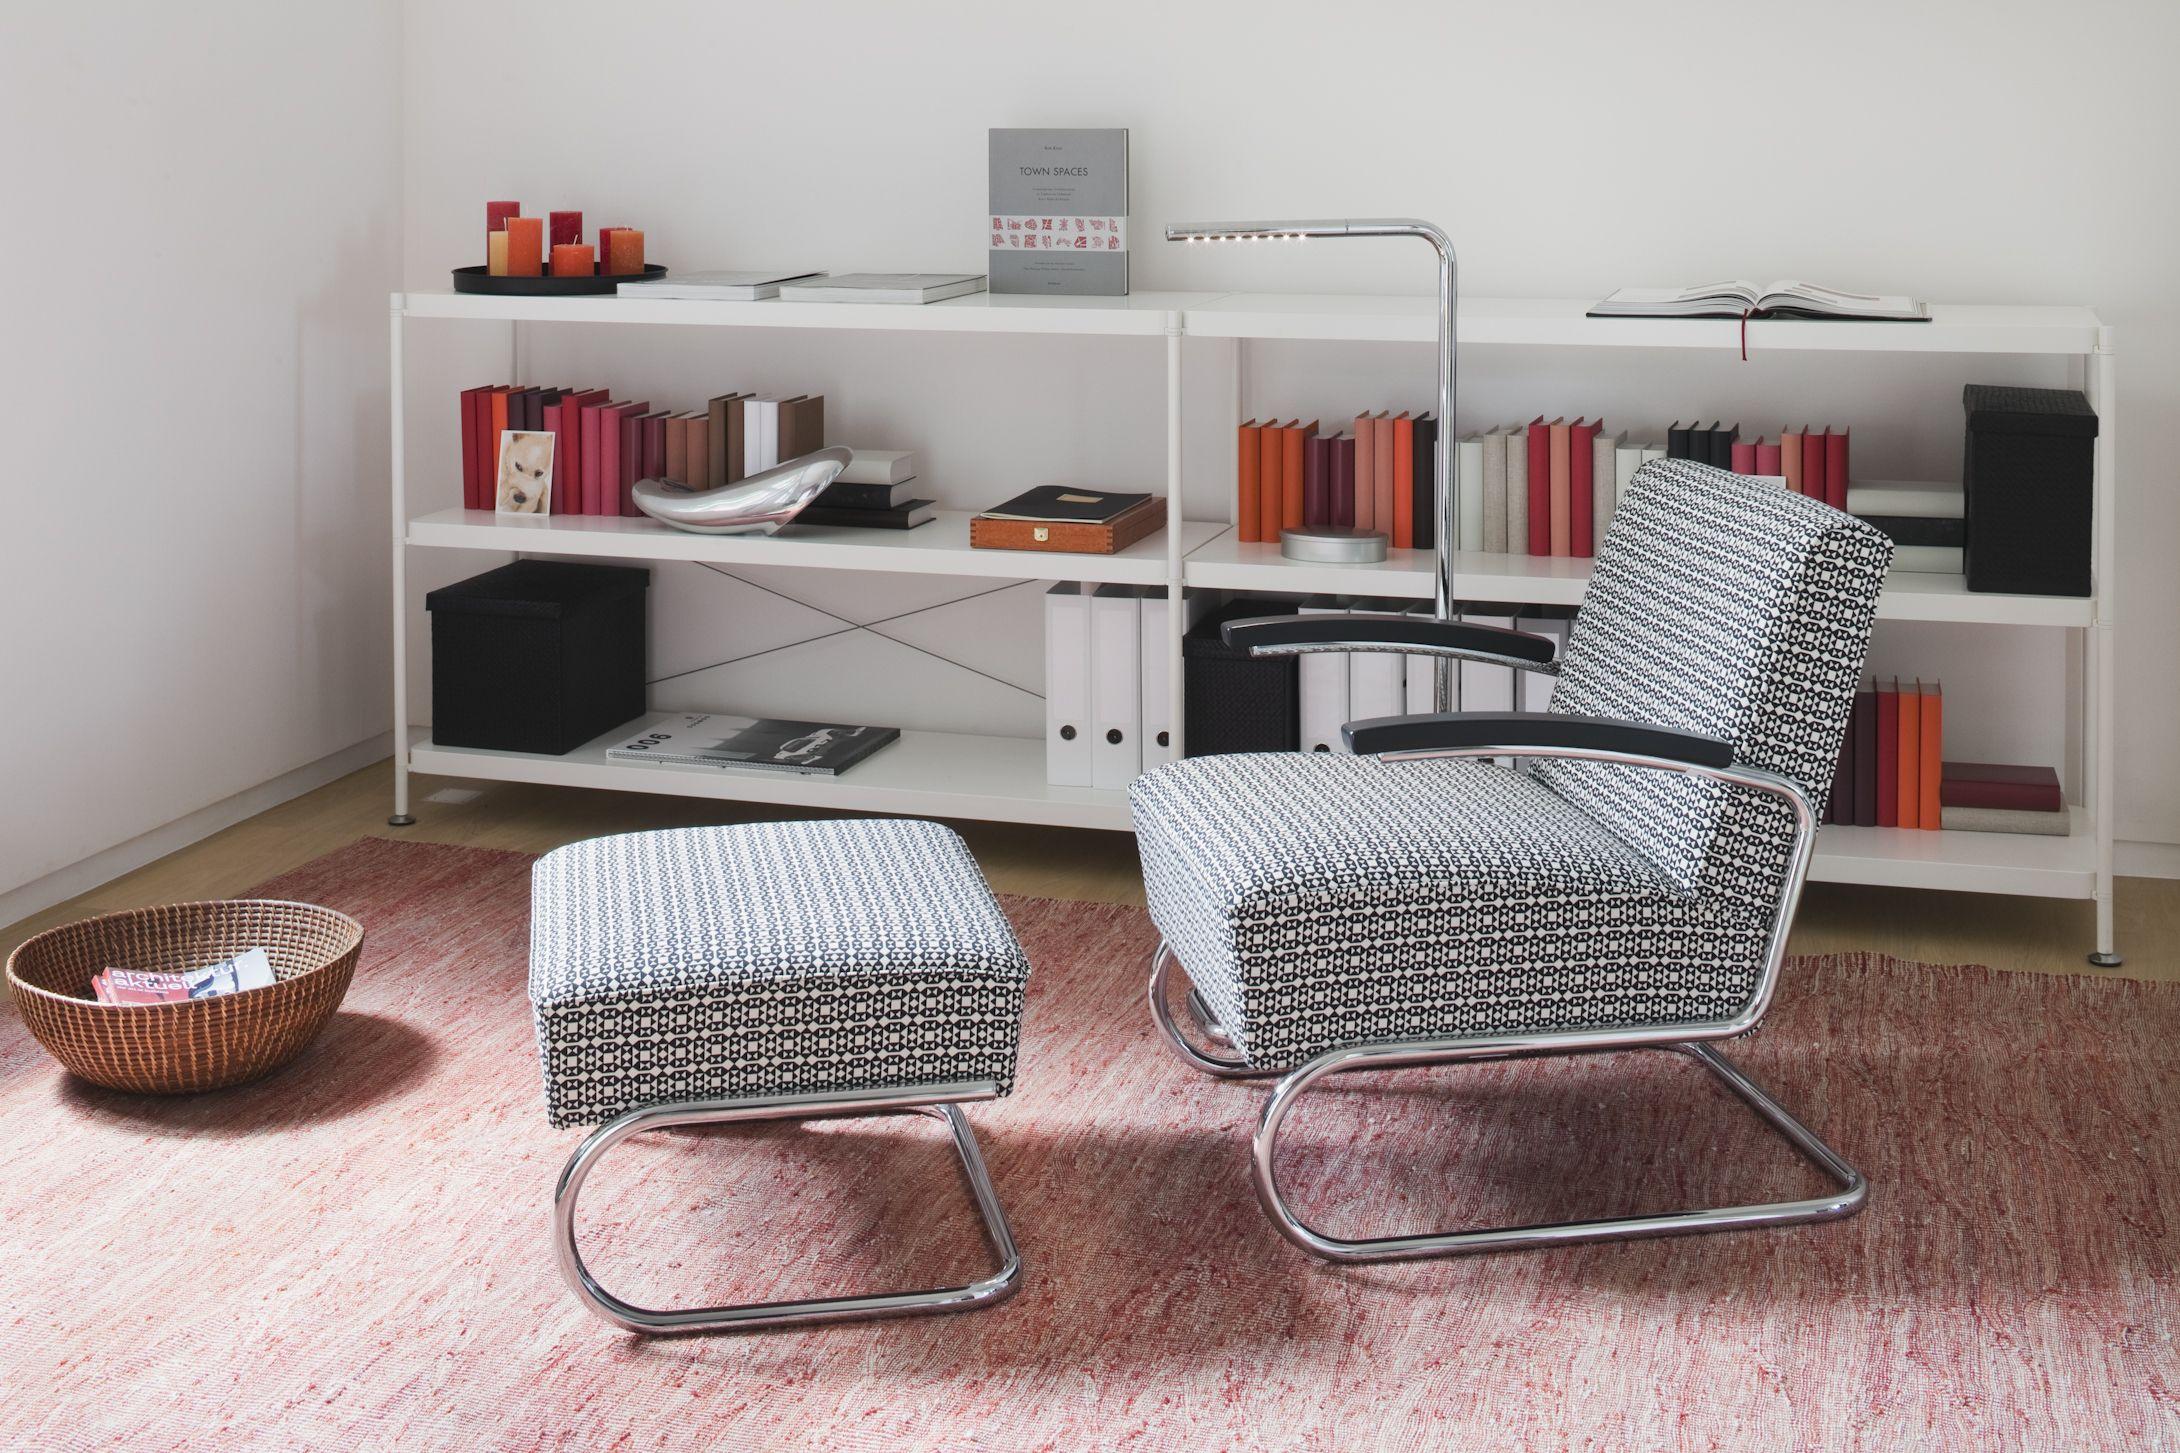 Thonet   S 411   Bauhaus möbel, Sessel, Hochwertige möbel